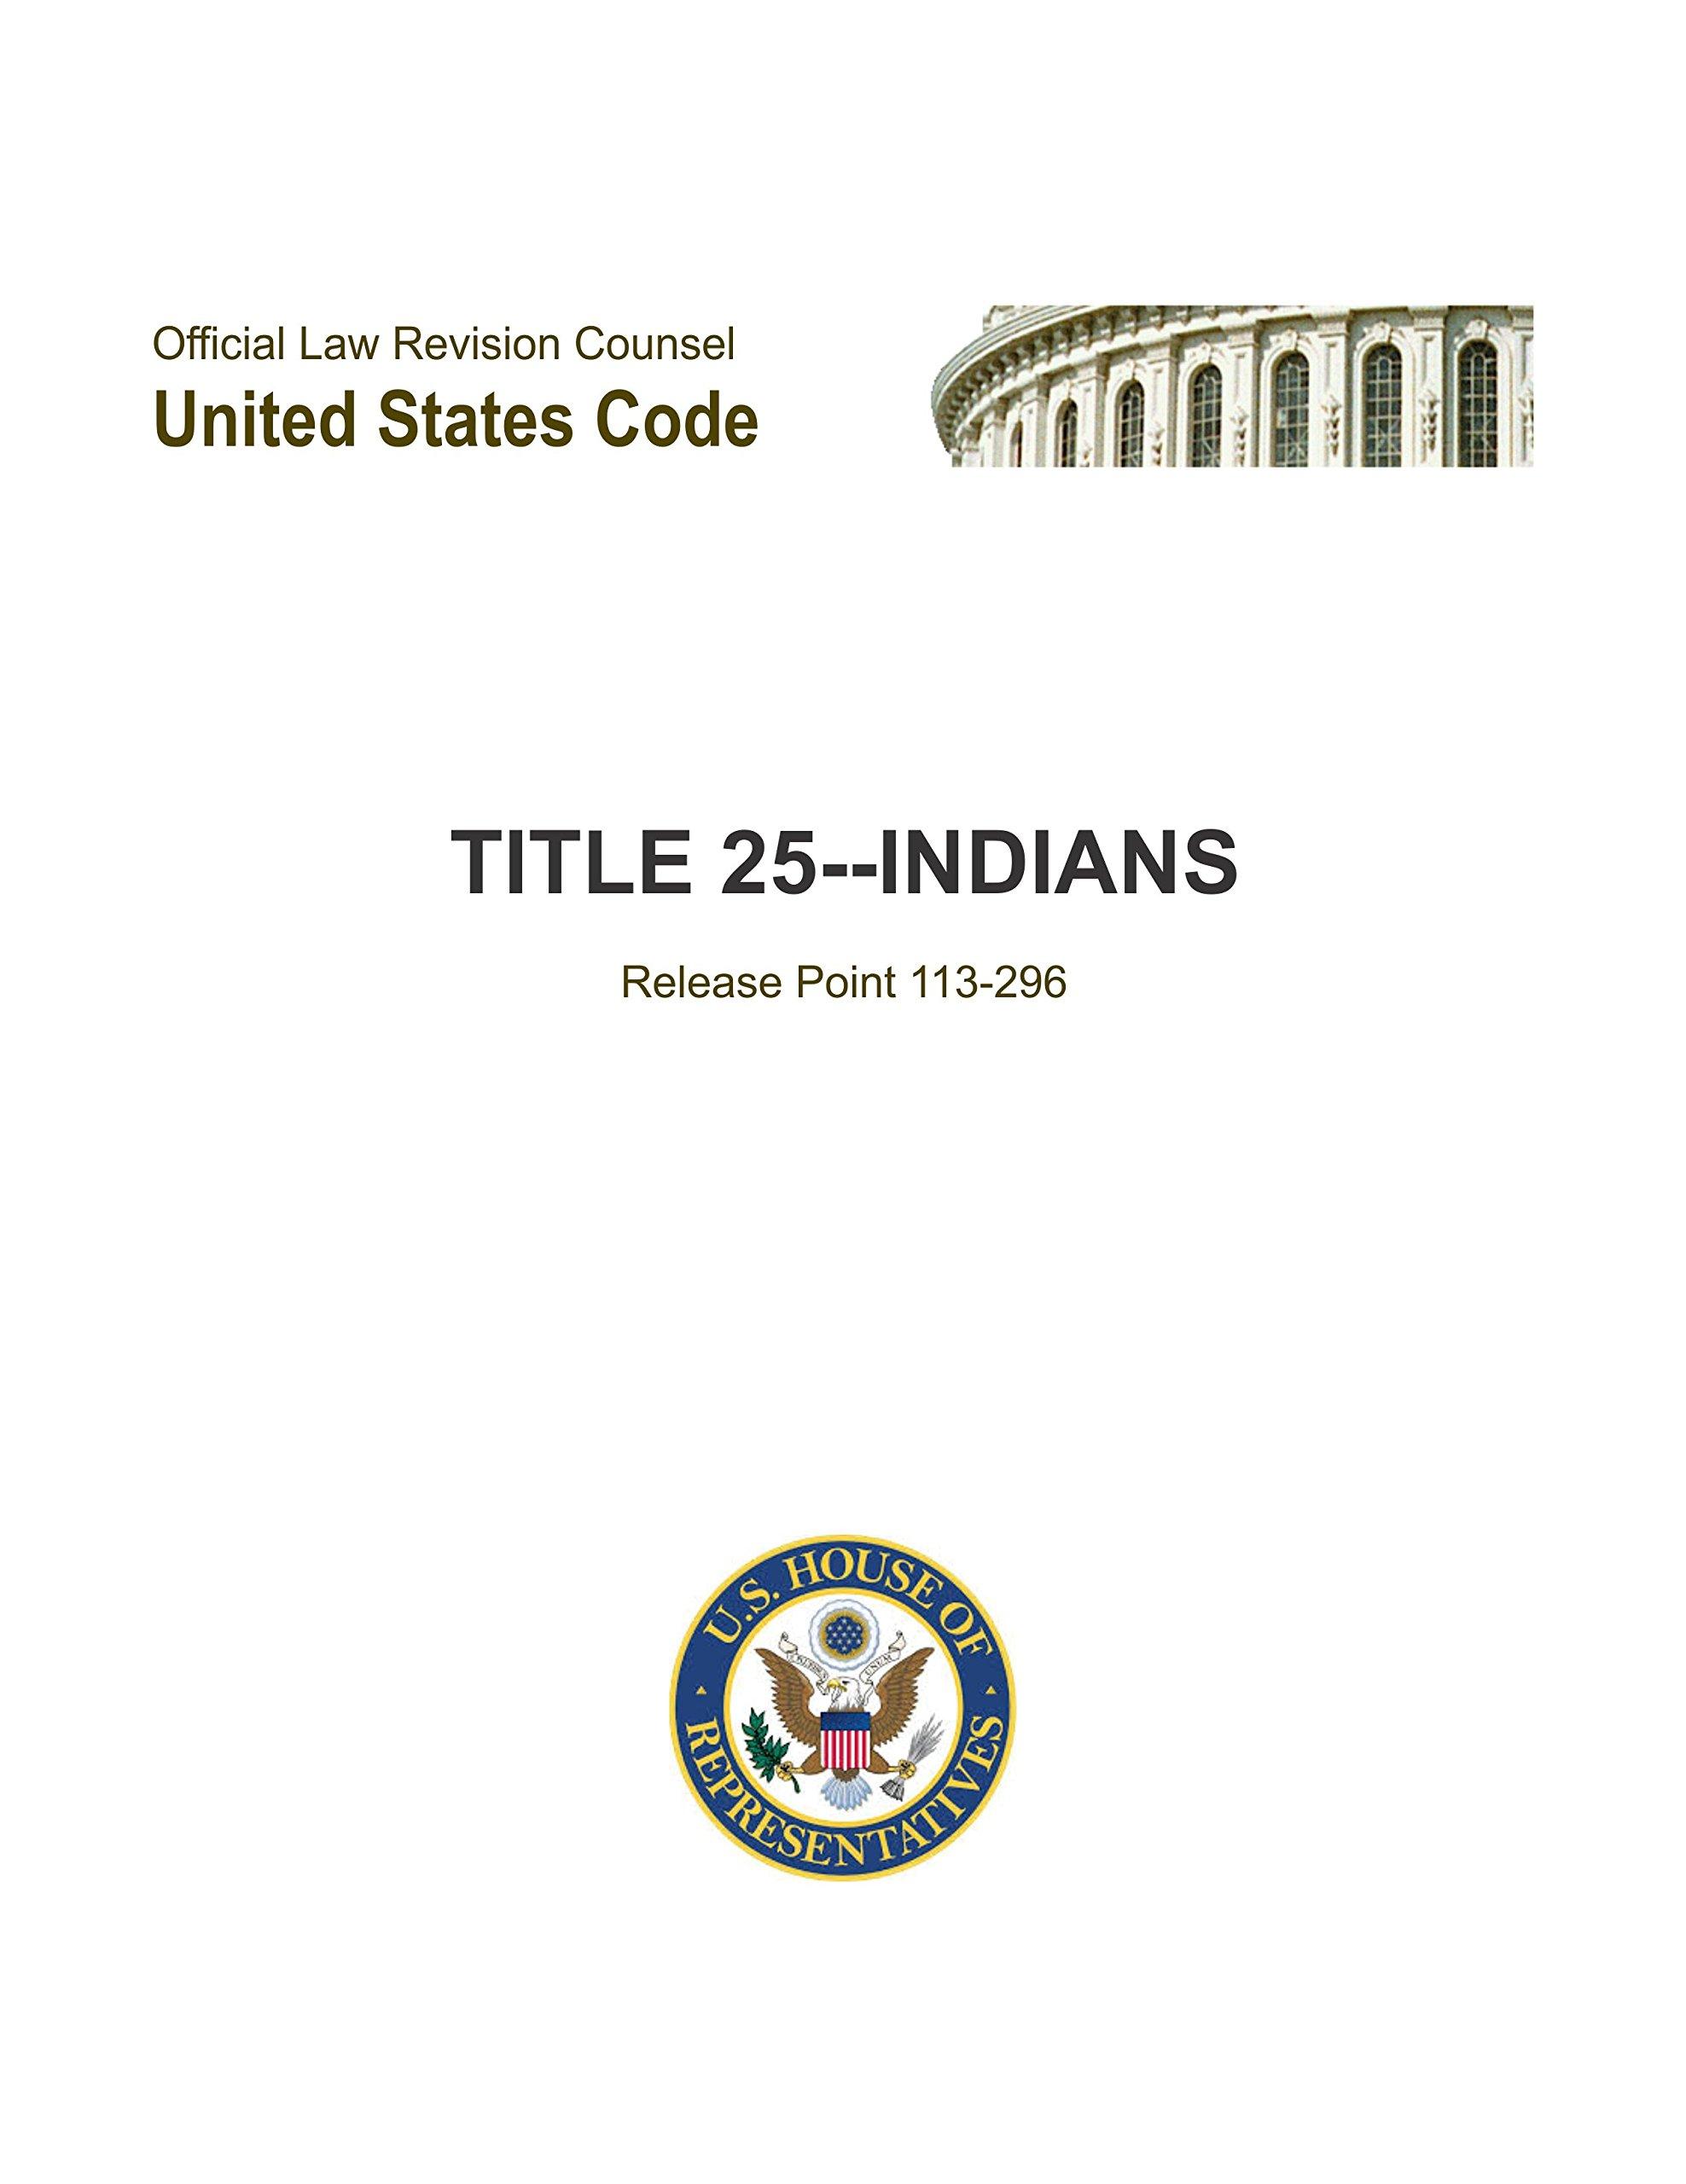 US Code Title 25 Indians. Complete to Date. [Loose Leaf Publication April 11, 2015.] pdf epub